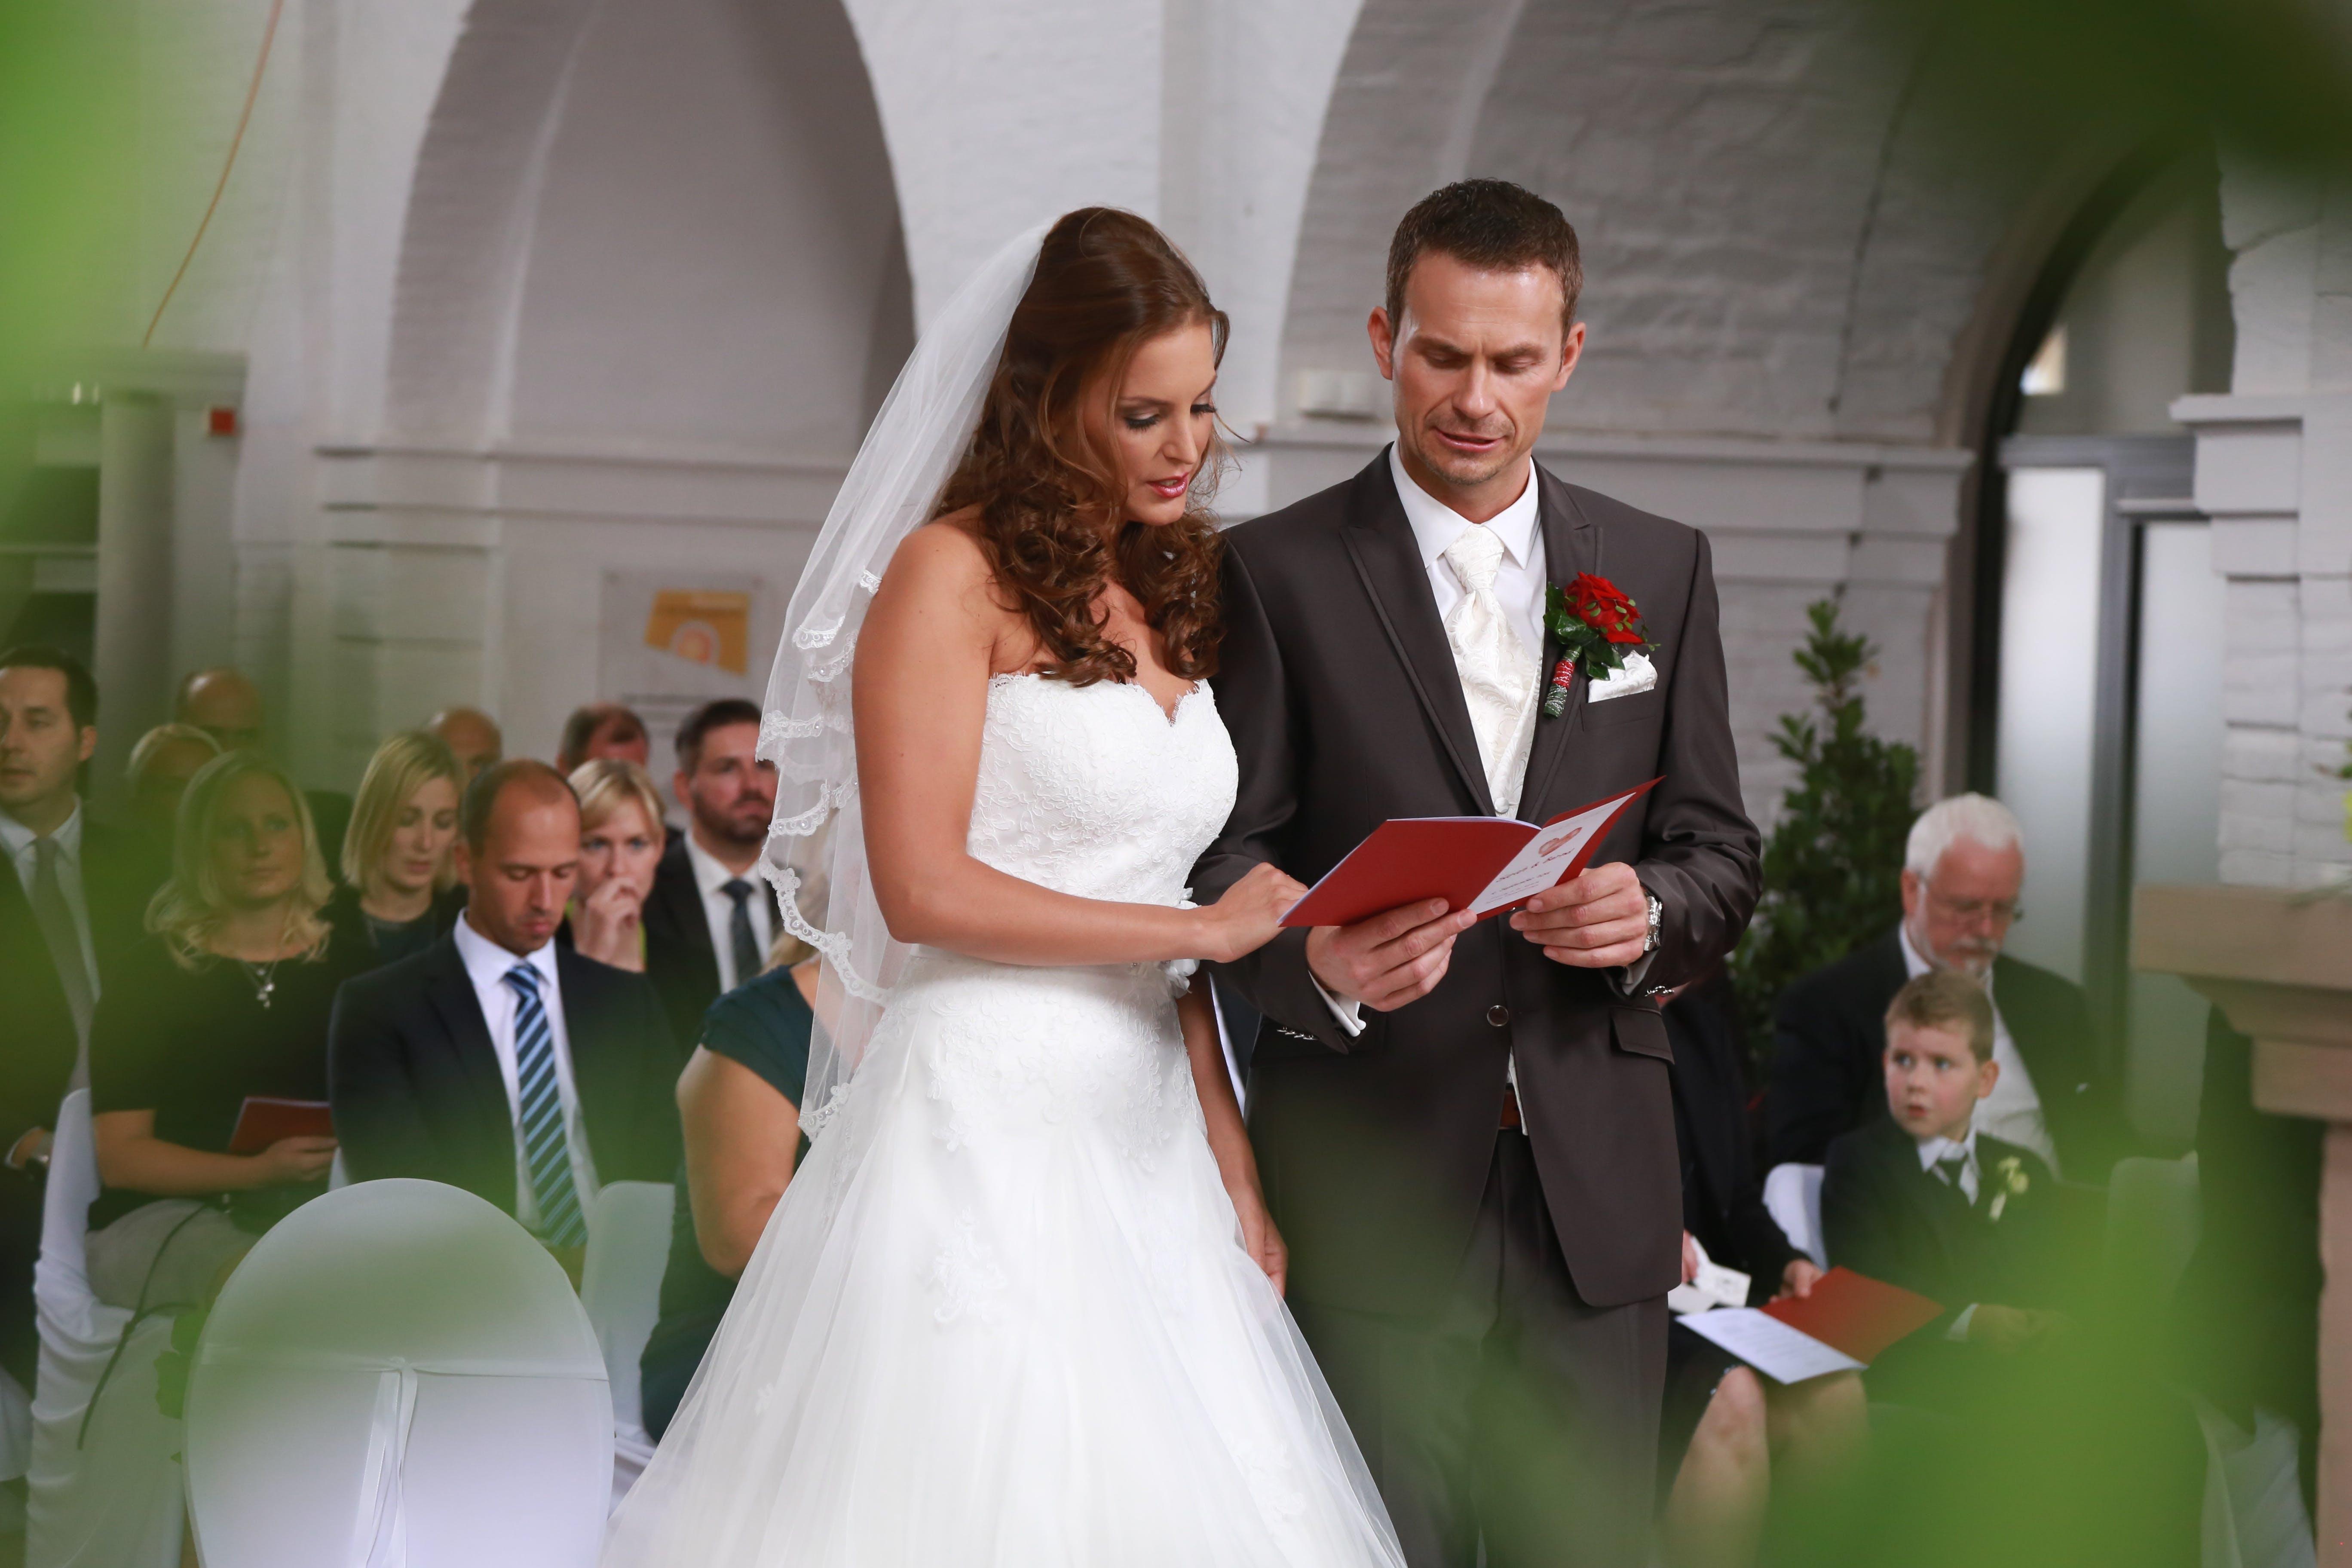 Free stock photo of adults, bride, celebration, ceremony